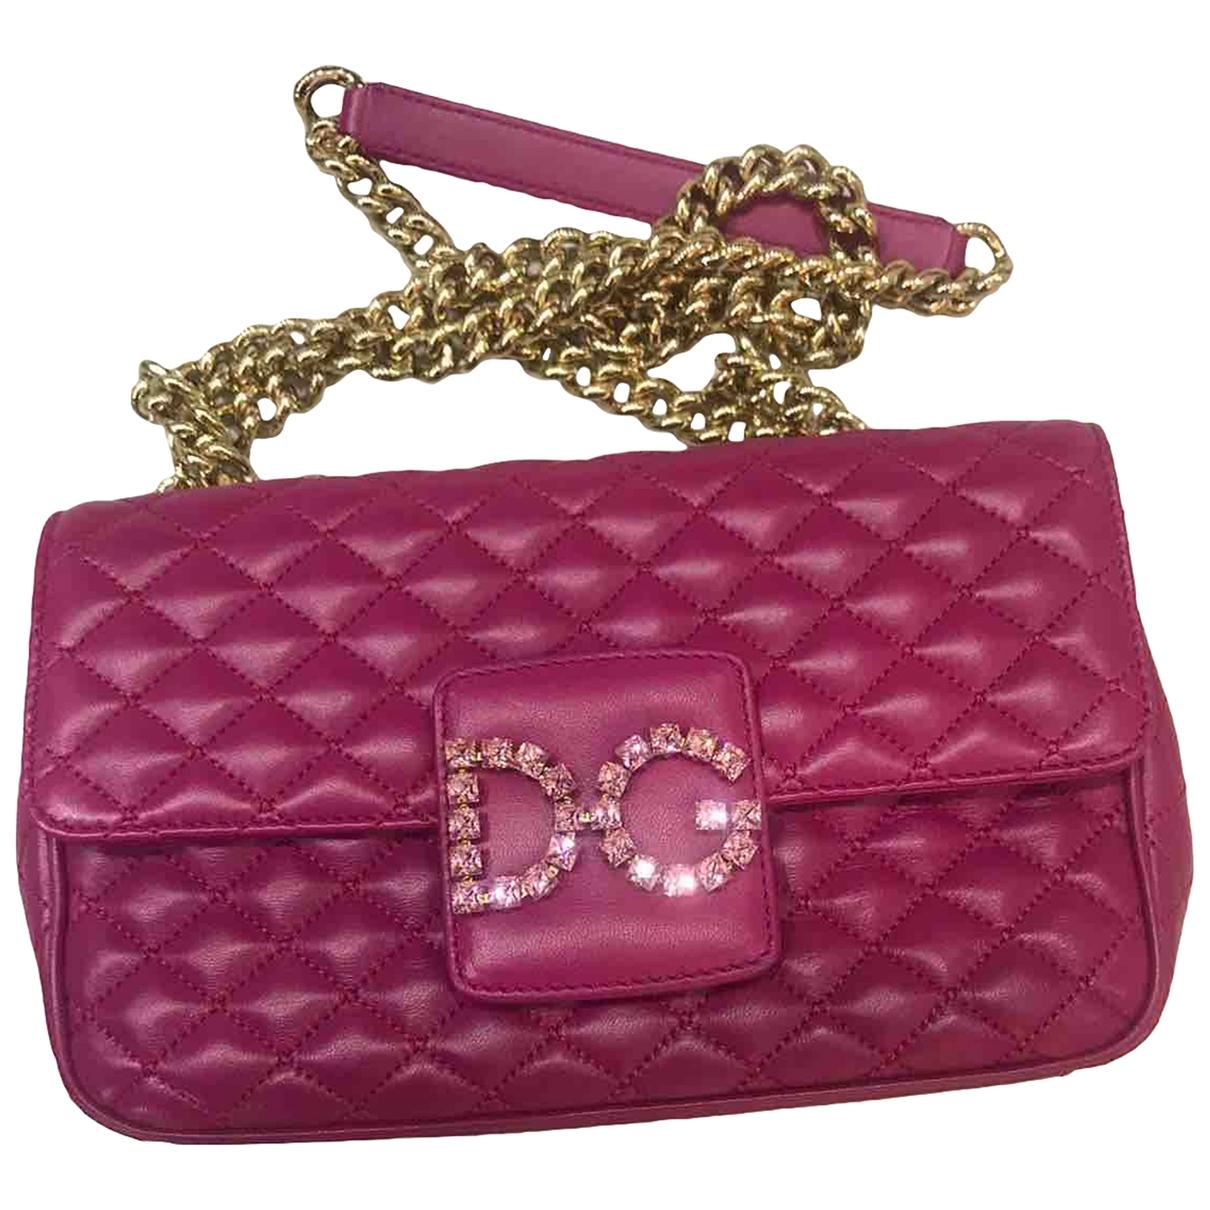 Dolce & Gabbana Millenials Pink Leather handbag for Women \N